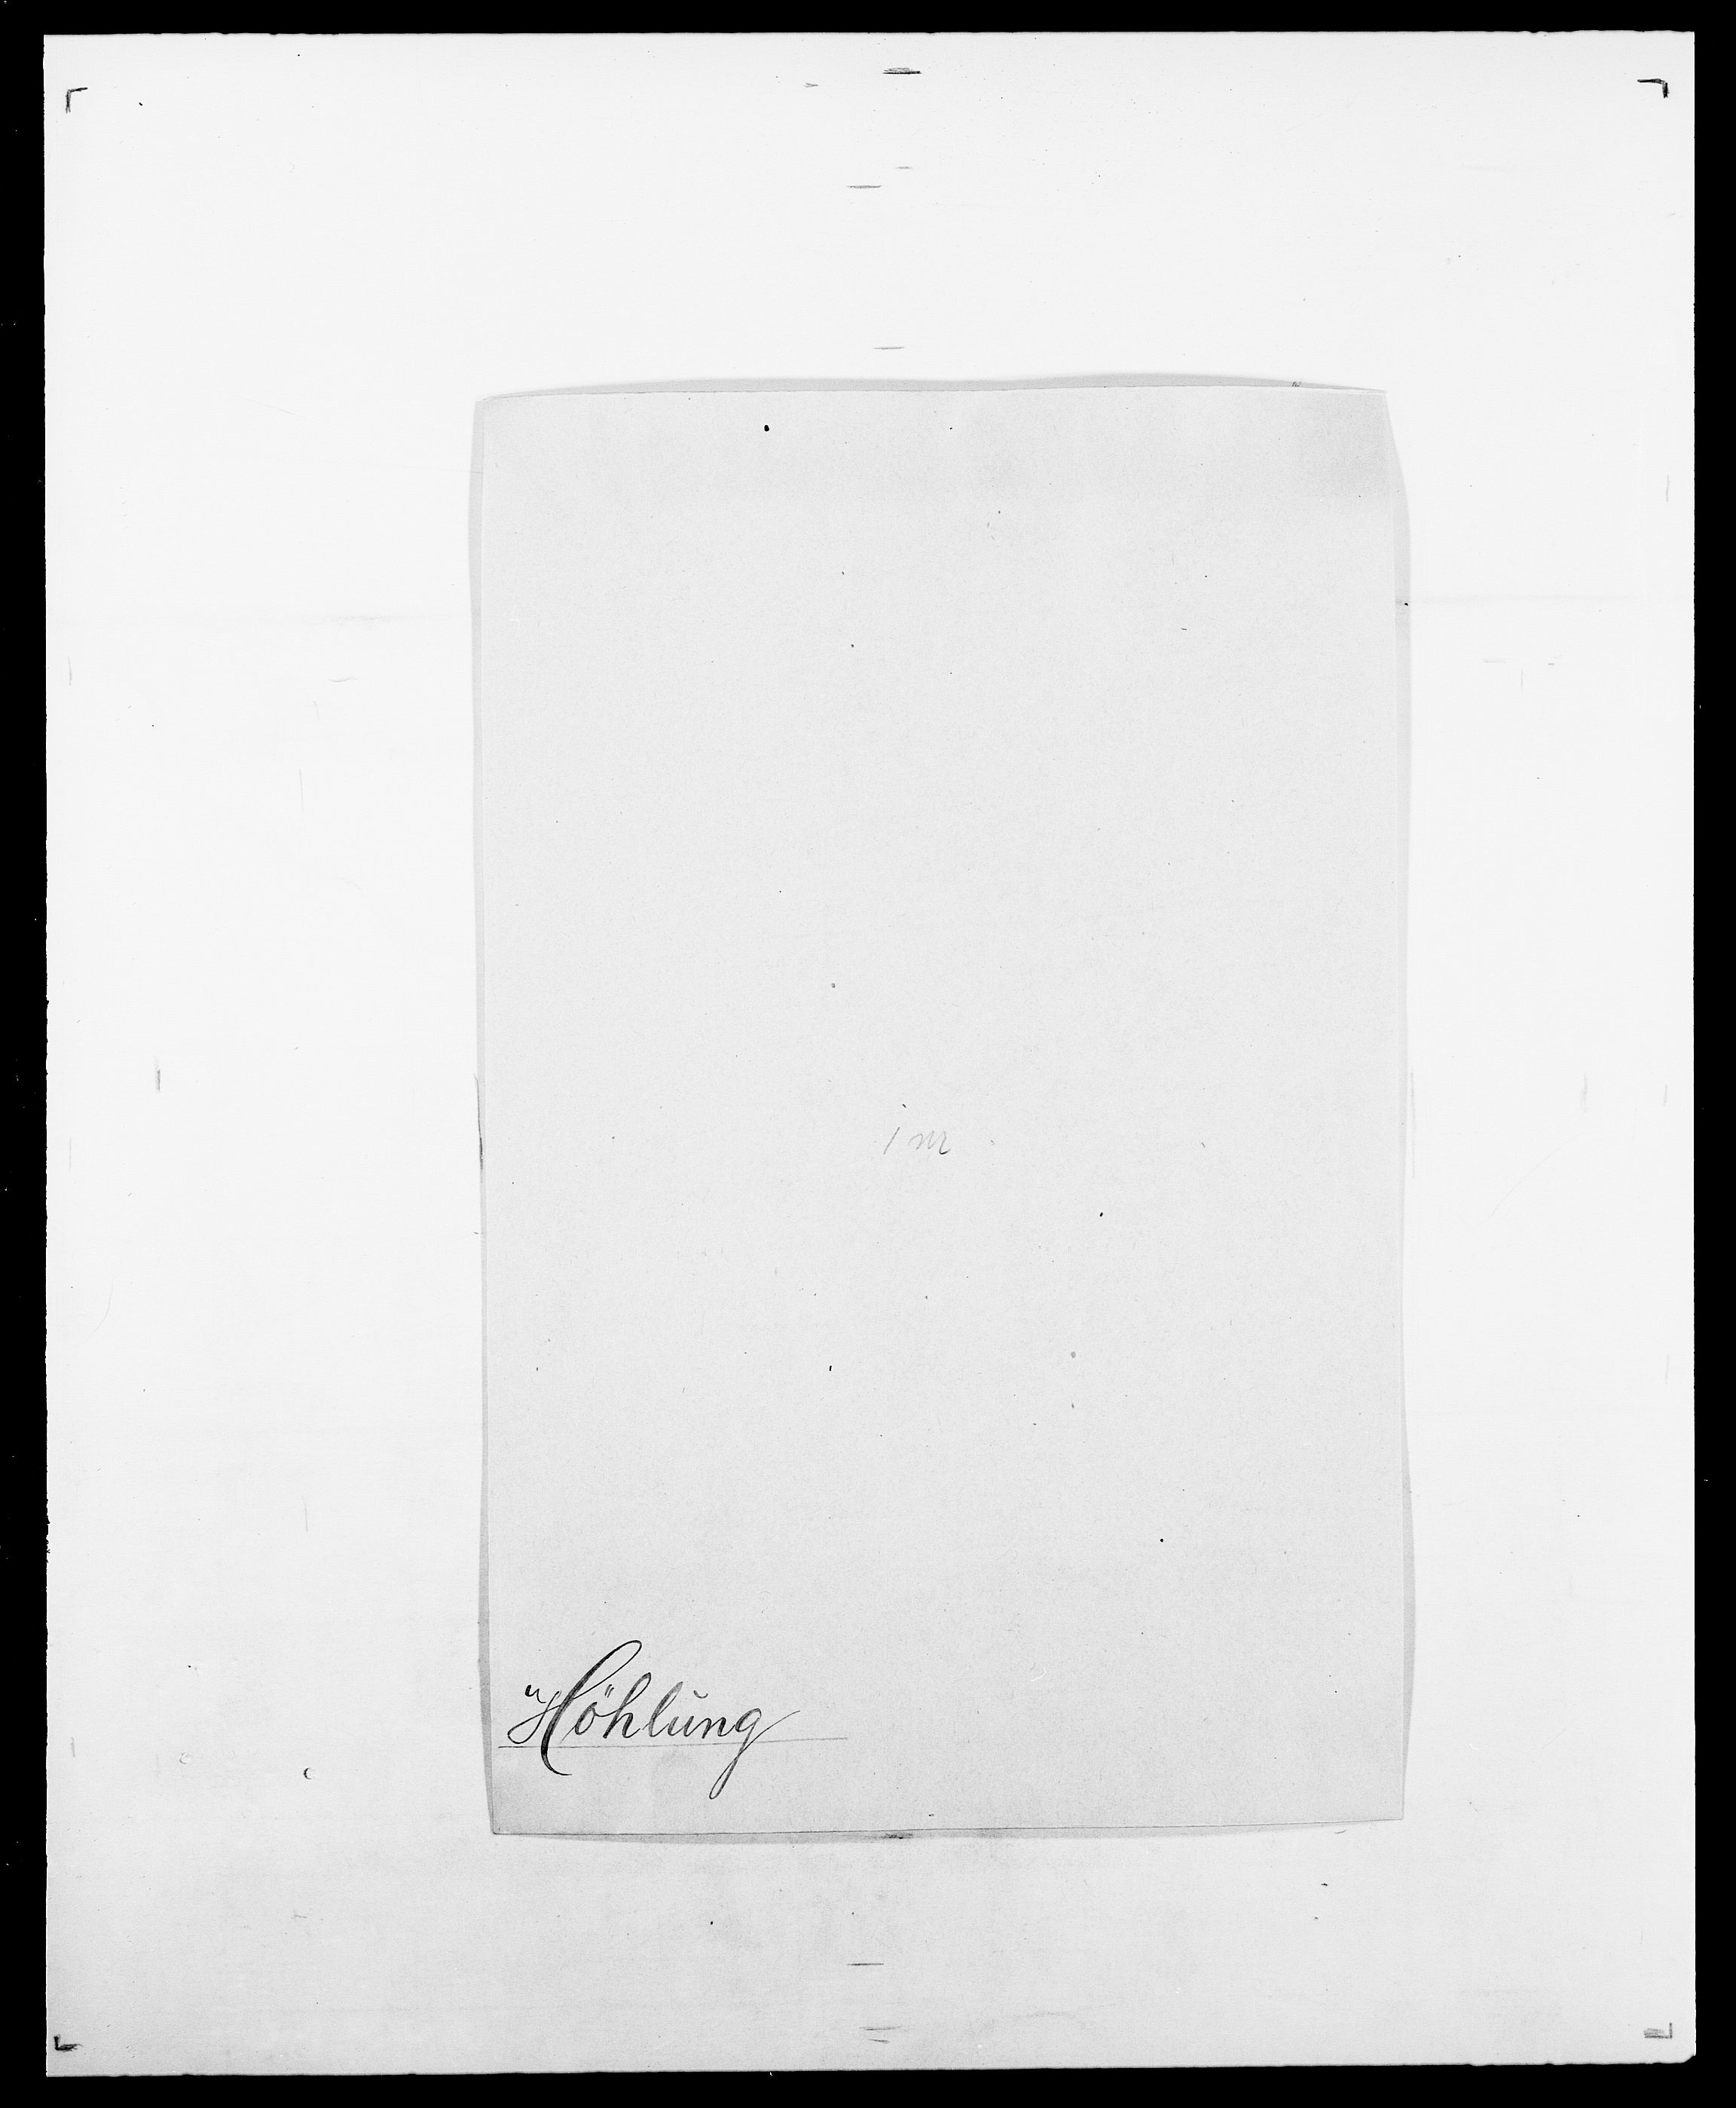 SAO, Delgobe, Charles Antoine - samling, D/Da/L0019: van der Hude - Joys, s. 350